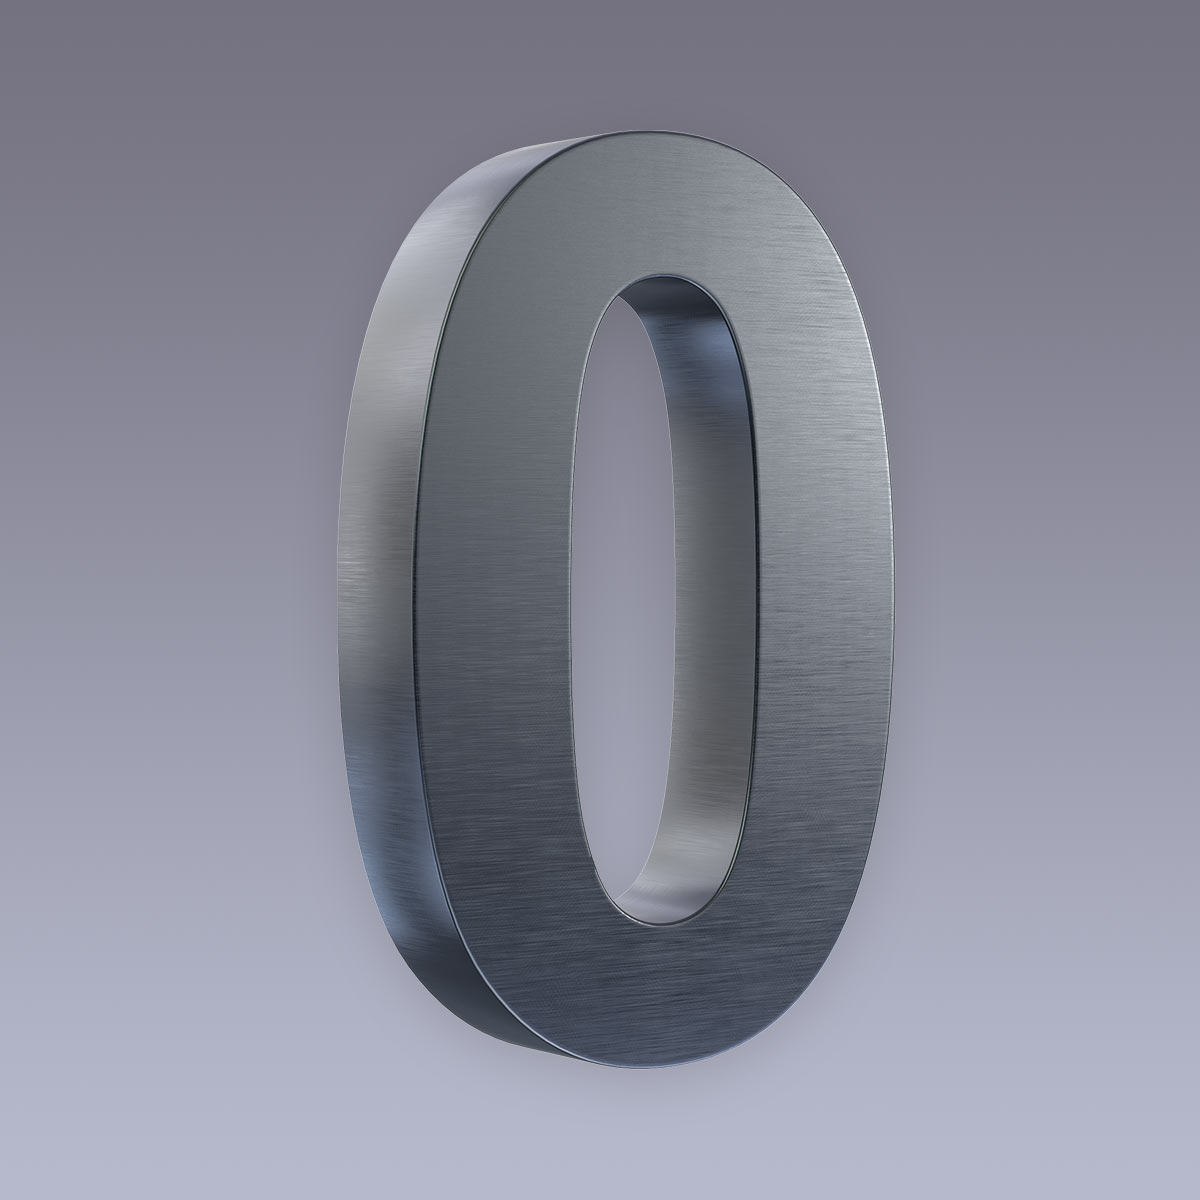 3D Hausnummer 0 Edelstahl anthrazit RAL7016 in 3D Design Arial